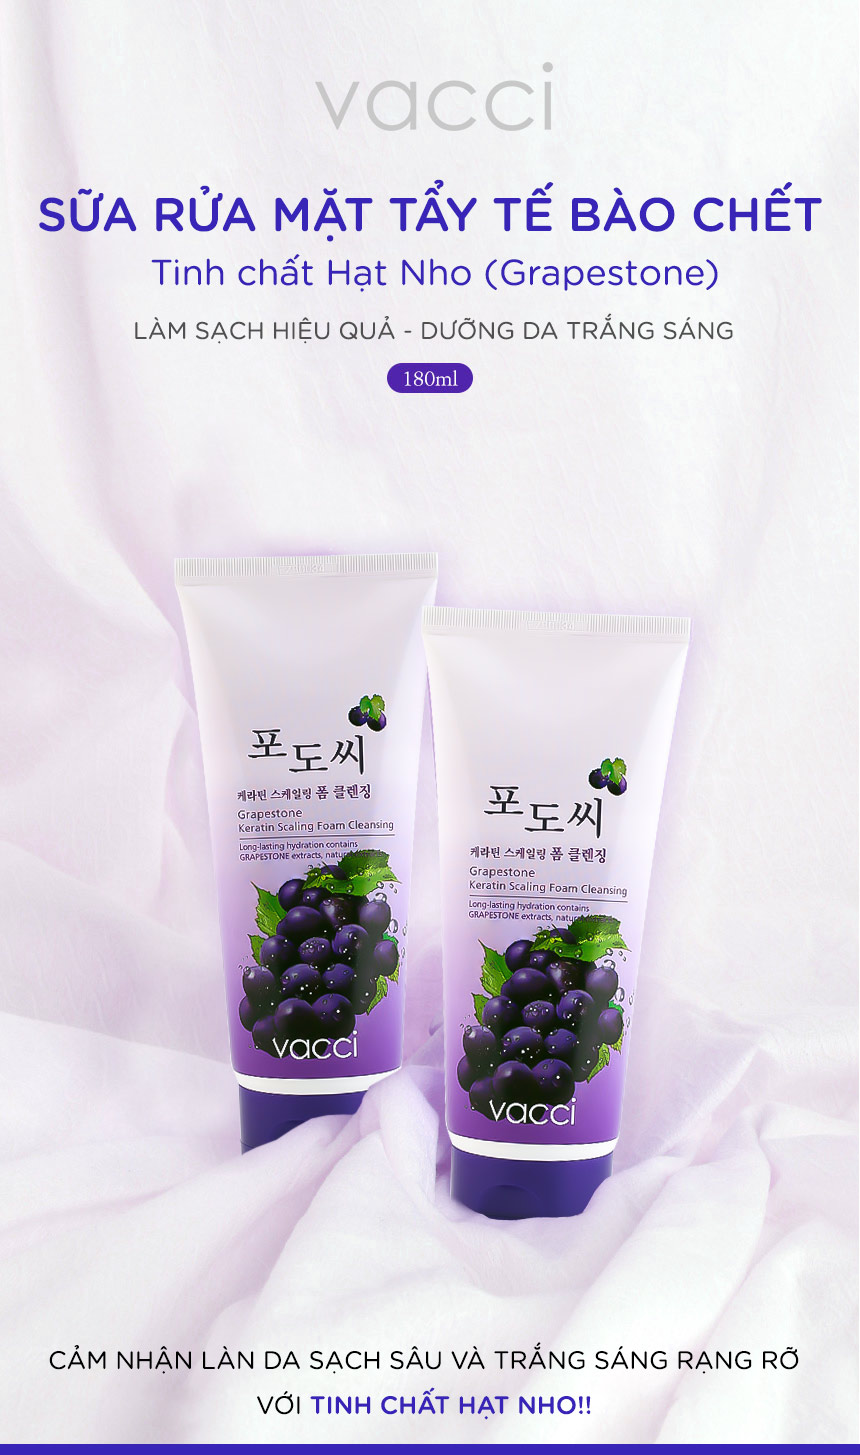 Sữa rửa mặt chất Hạt nho Vacci Grape Seed Foam Cleansing 180ml